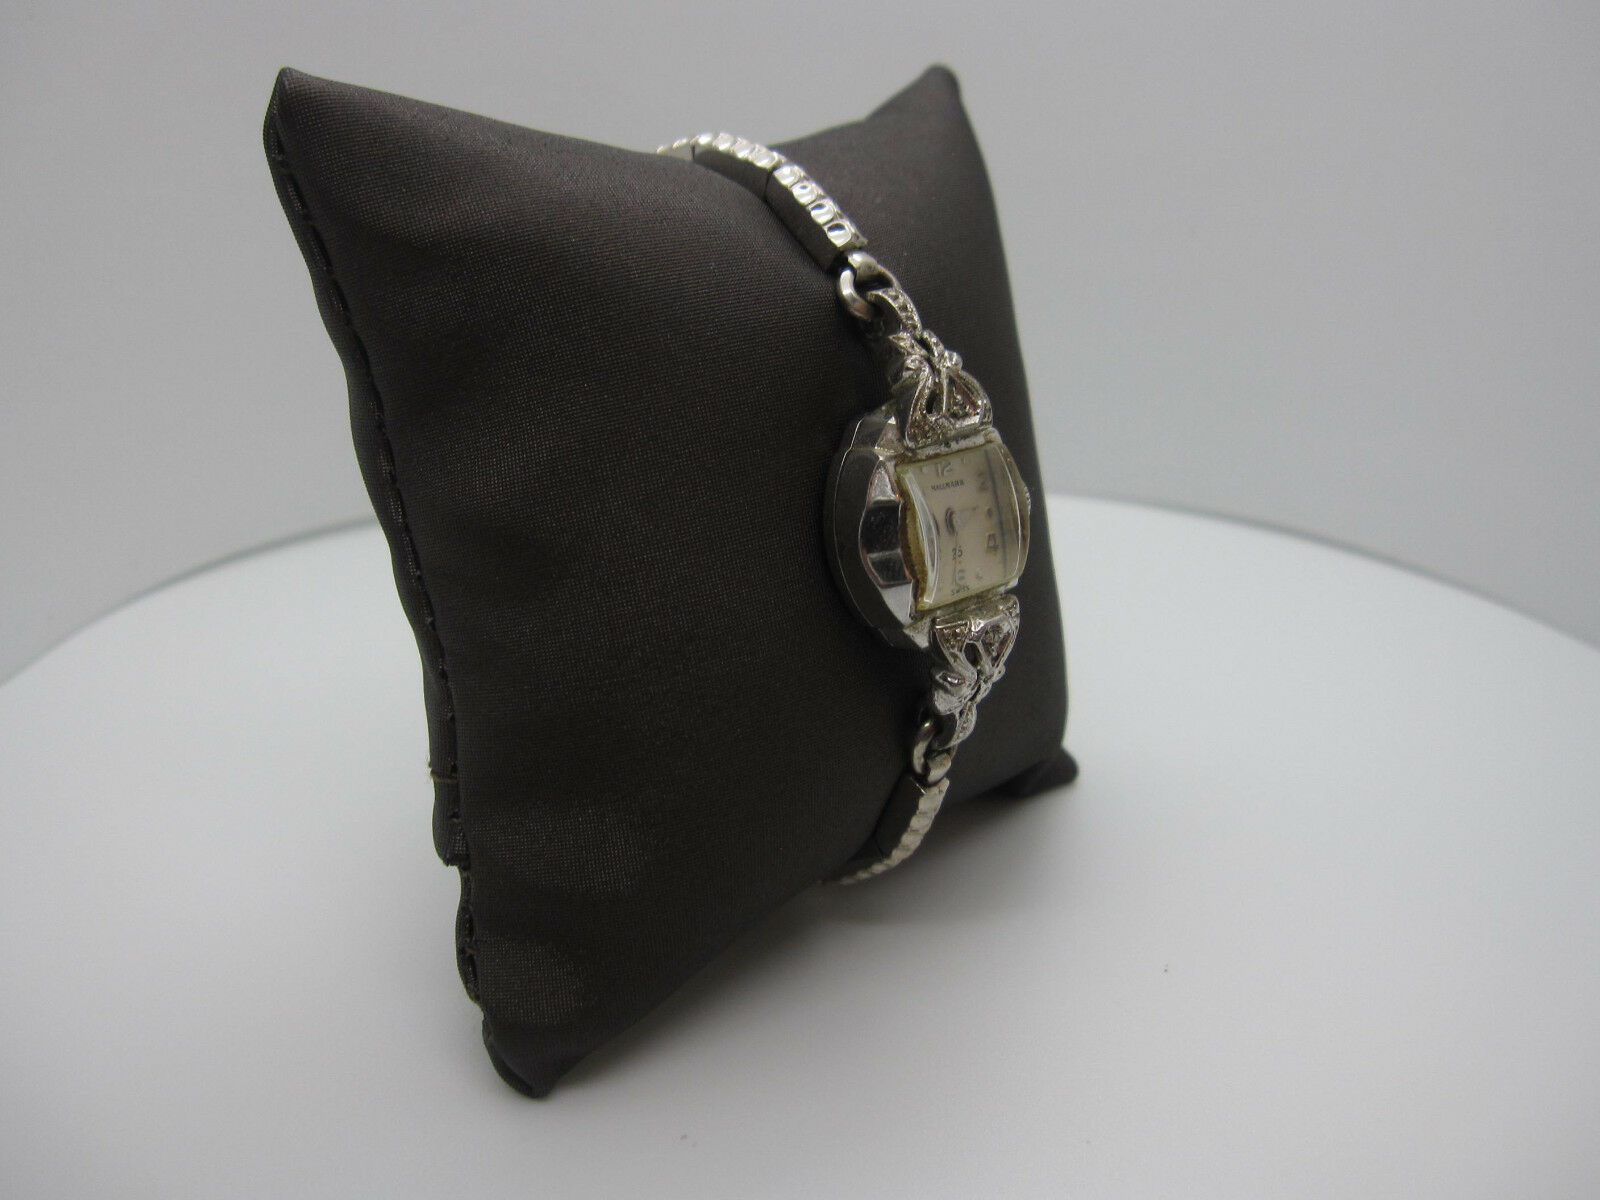 Vintage Women's Hallmark 25 Jewels 10k Rolled Gold Plated Hand Wind Watch image 2